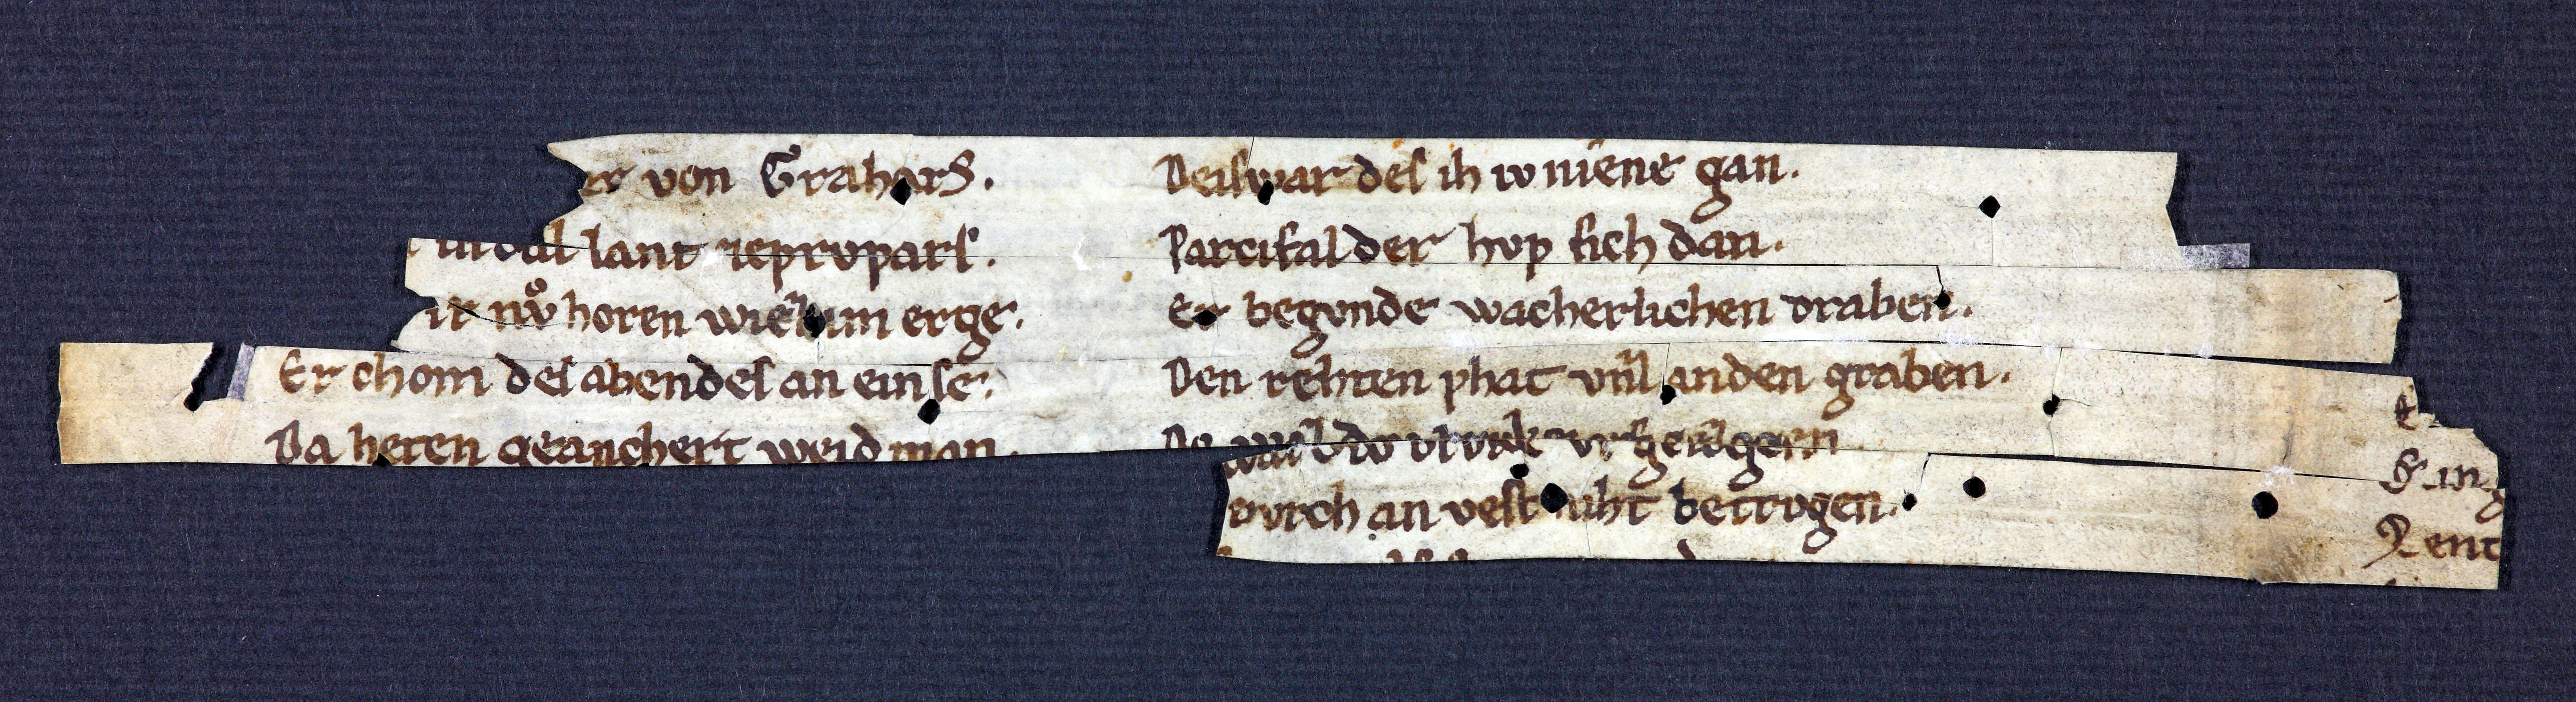 Abb. 1) Das neu aufgefundene Parzival-Fragment, um 1220 (Naumburg, DSB, Fragm. 64, 1v)